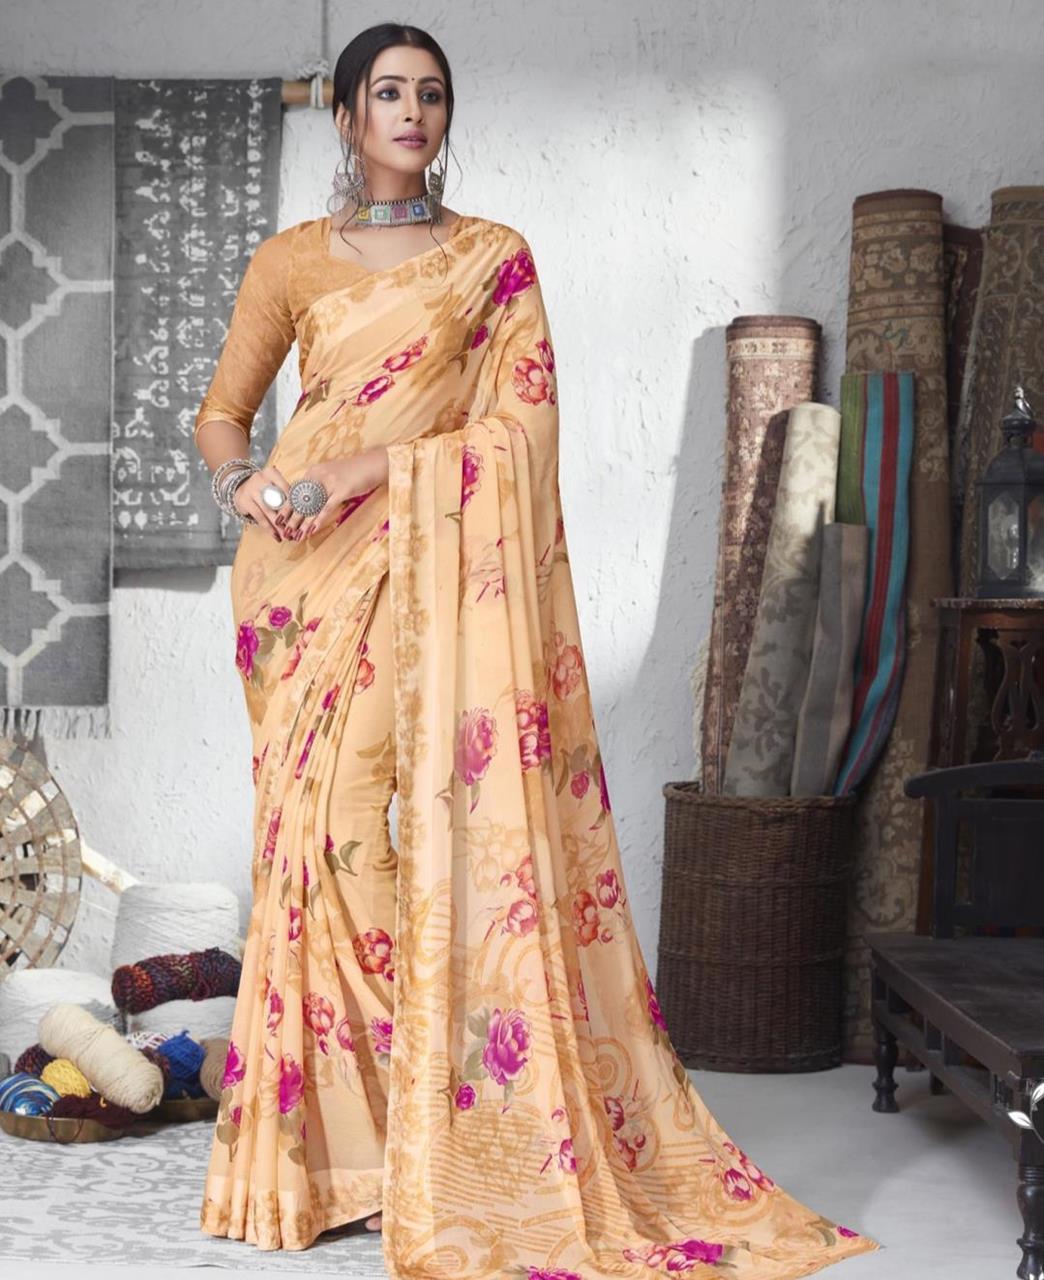 Printed Chiffon Saree in Cream